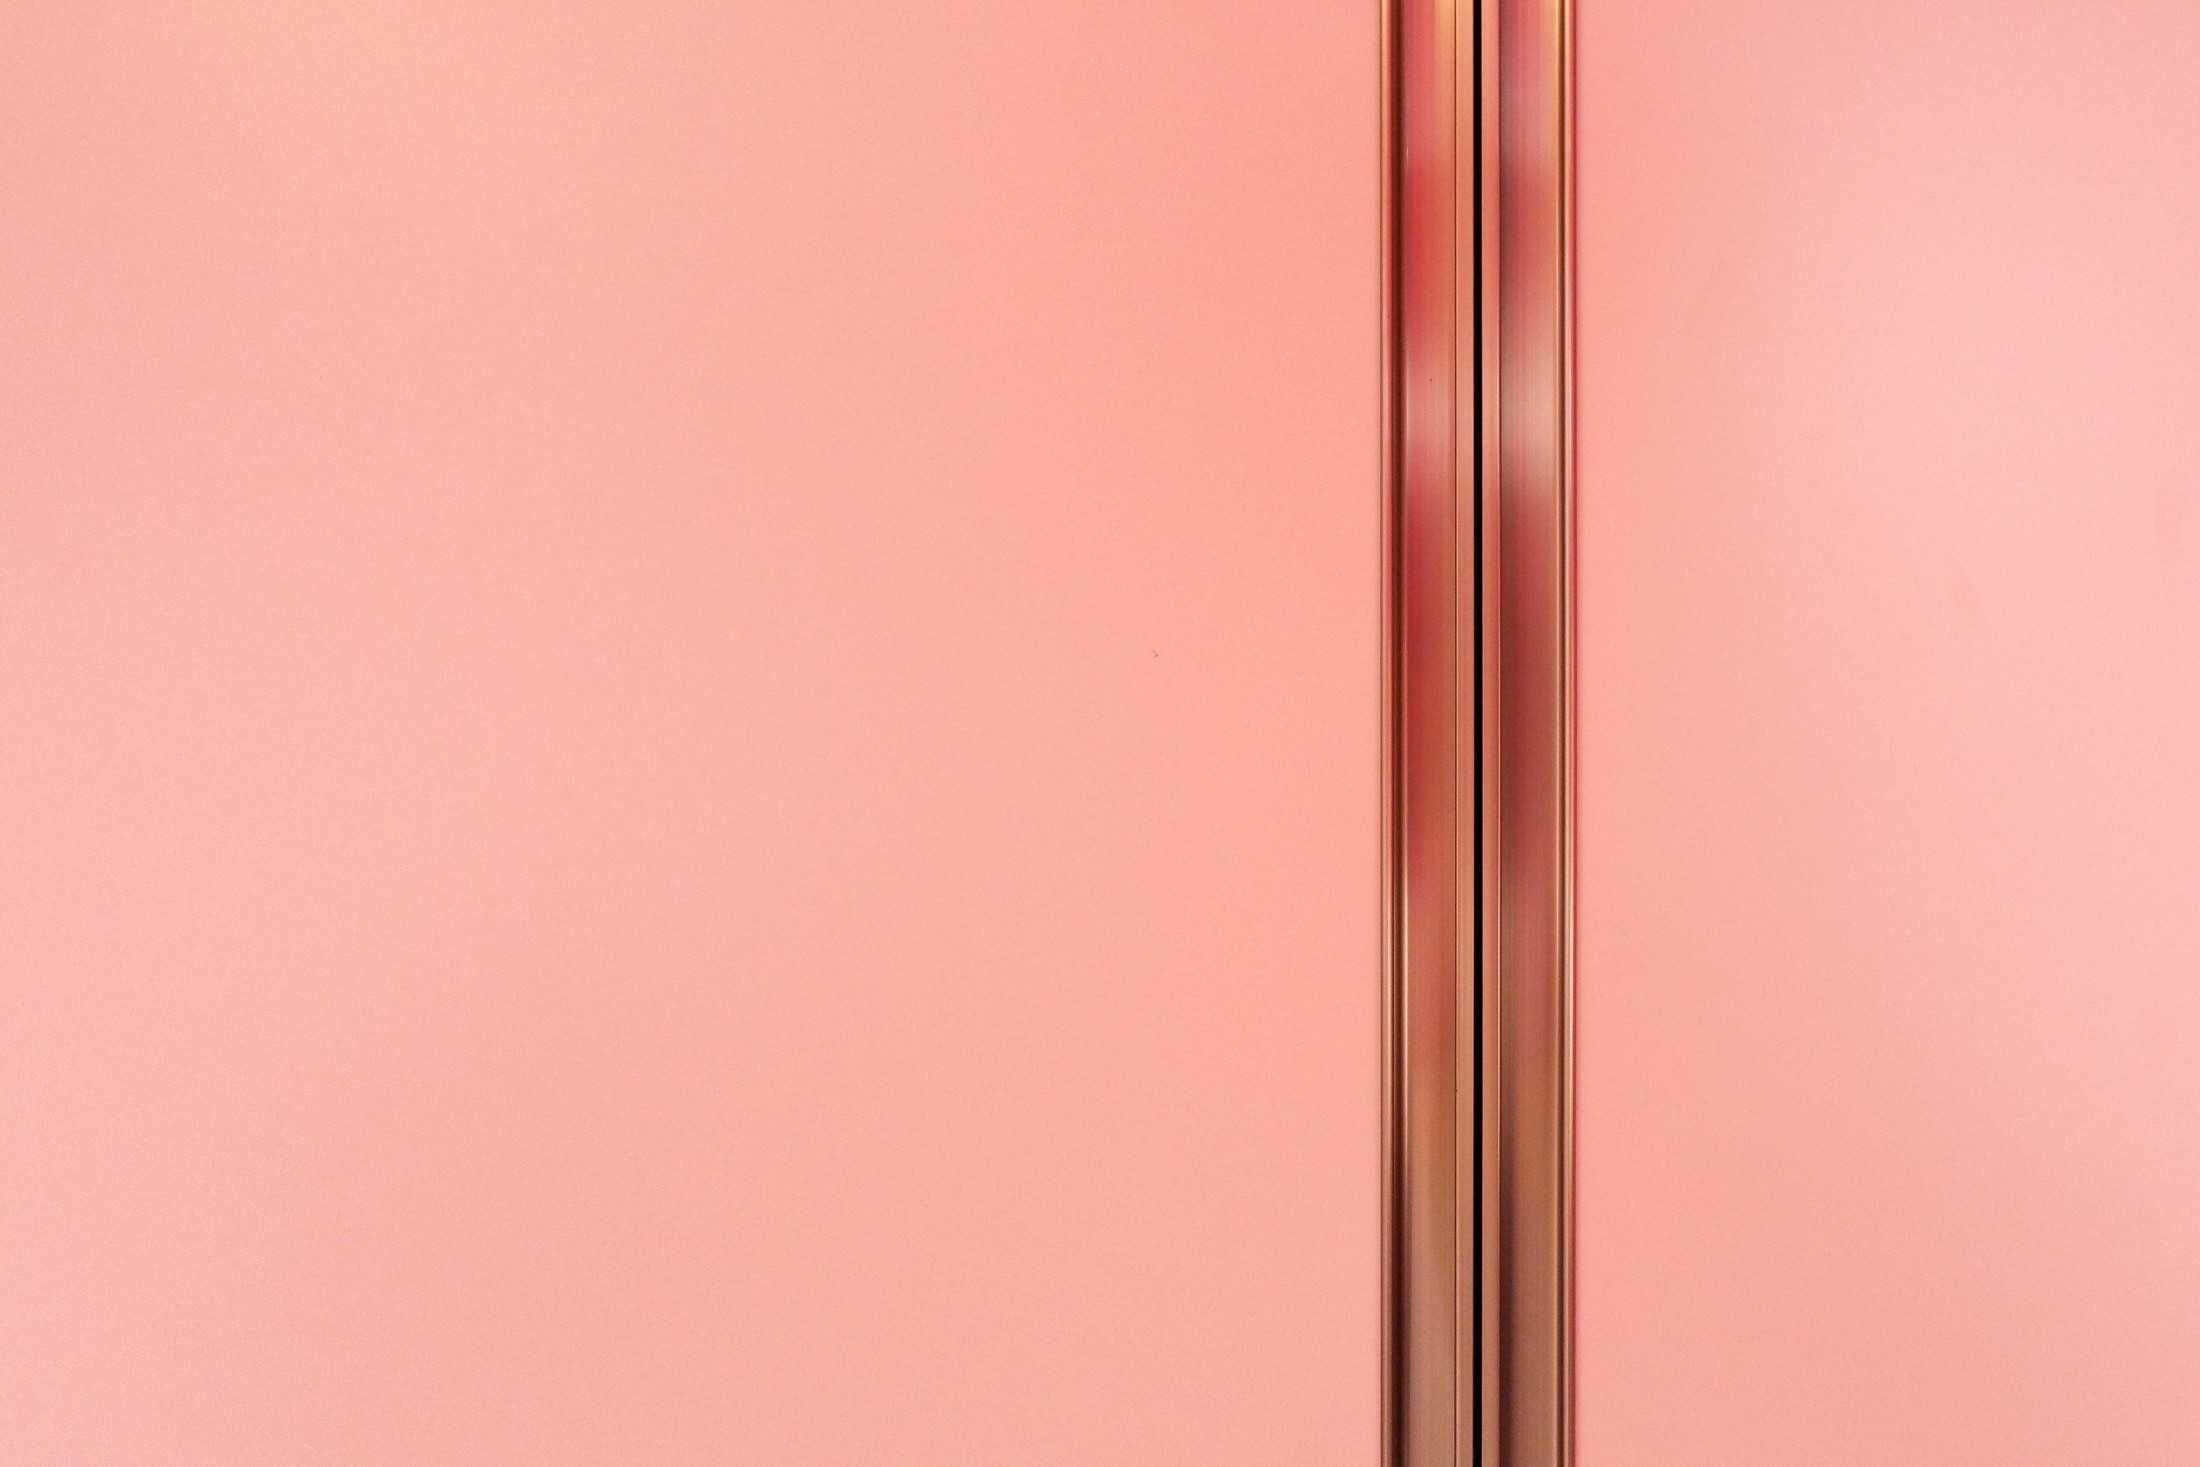 Dica Selaras Wk House Jl. Kotamas Raya No.23, Padasuka, Cimahi Tengah, Kota Cimahi, Jawa Barat 40511, Indonesia Jl. Kotamas Raya No.23, Padasuka, Cimahi Tengah, Kota Cimahi, Jawa Barat 40511, Indonesia Dica-Selaras-Wk-House  62363